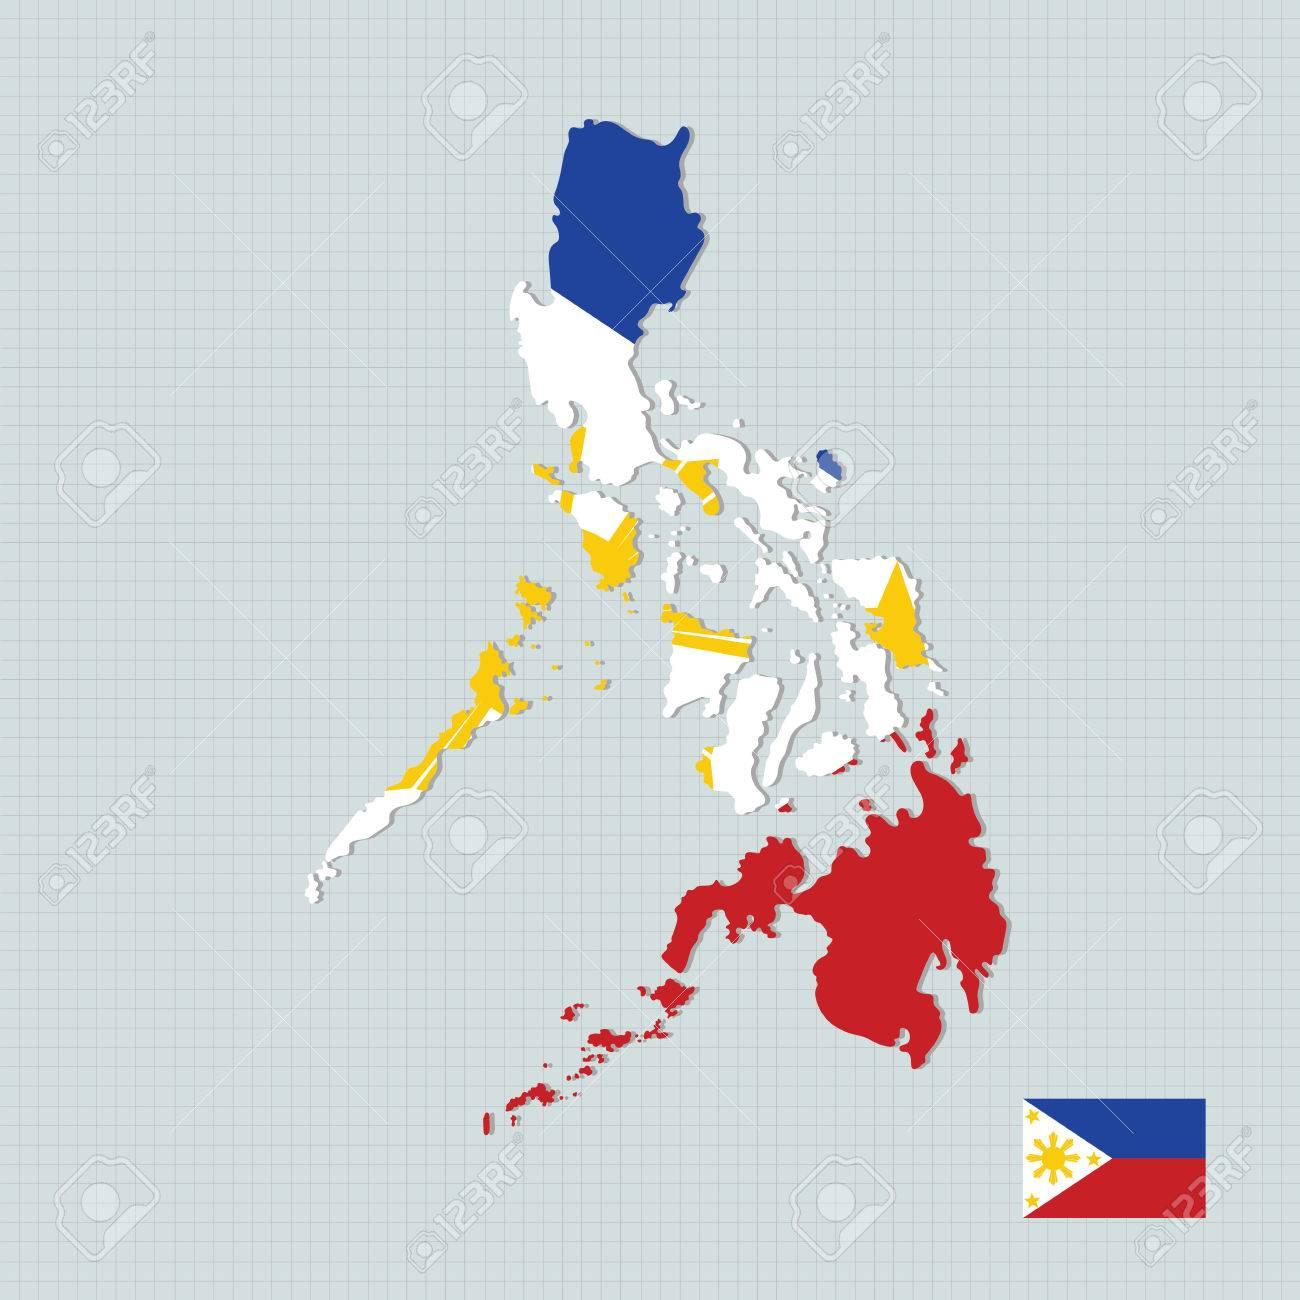 Philippines map,flag